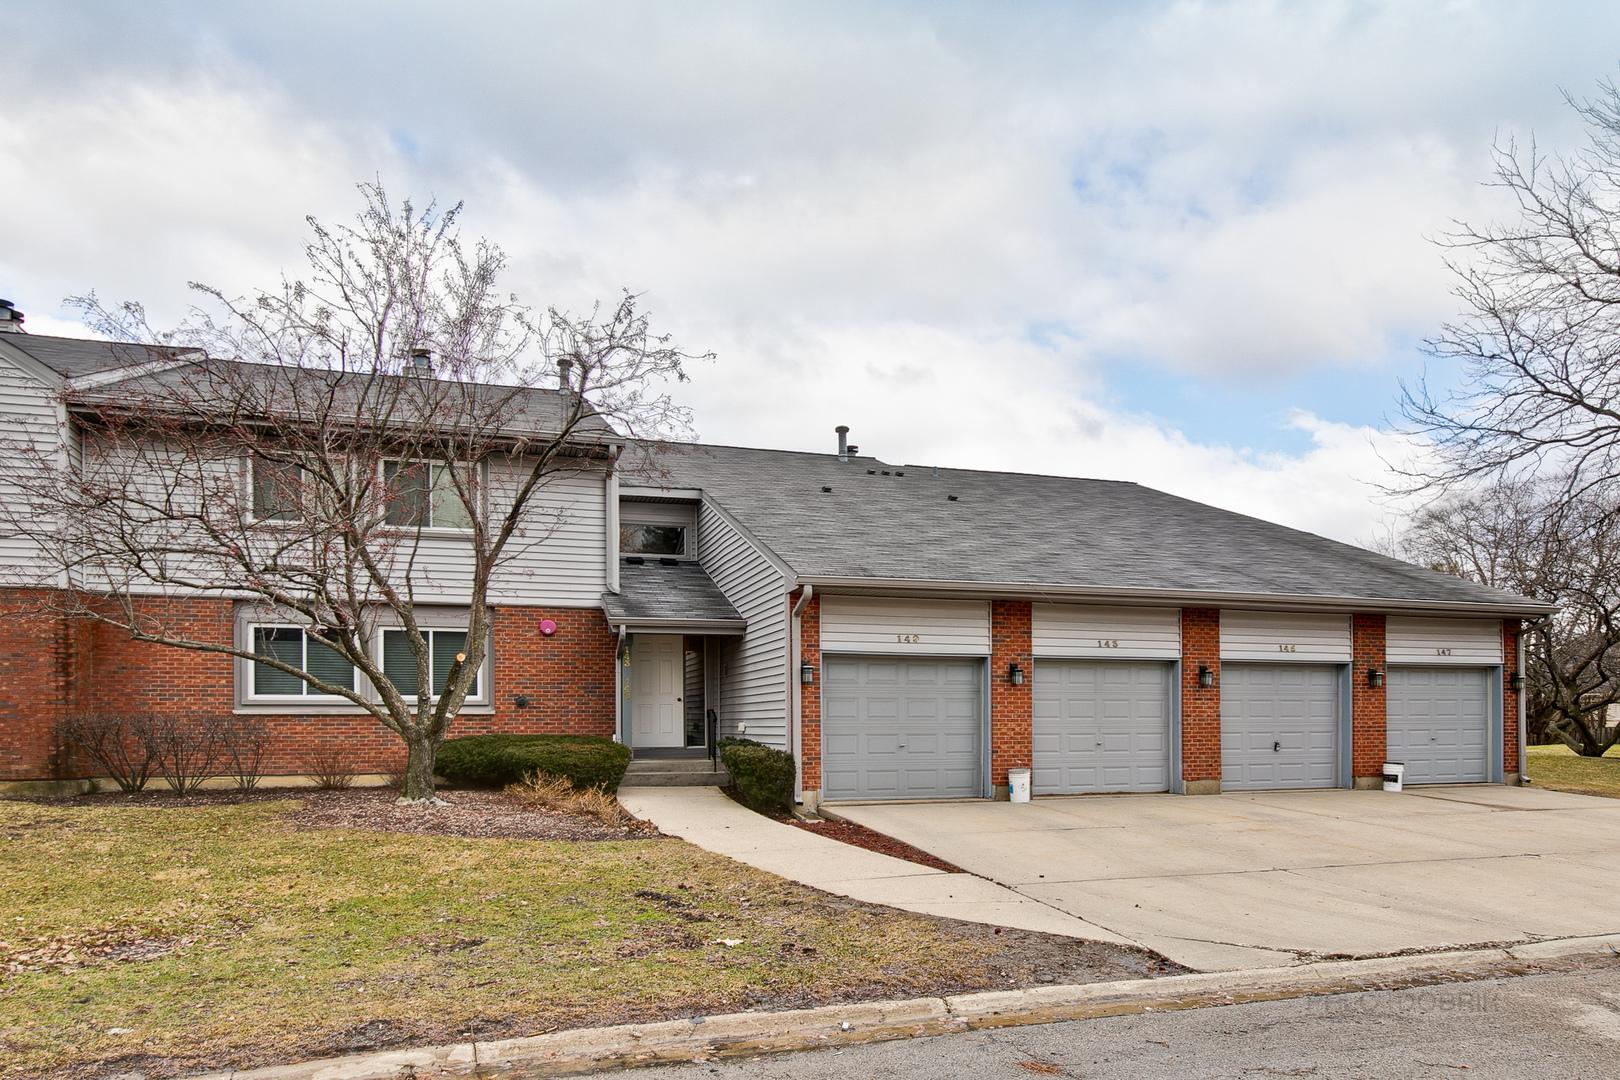 145 Morningside Unit Unit 145 ,Buffalo Grove, Illinois 60089